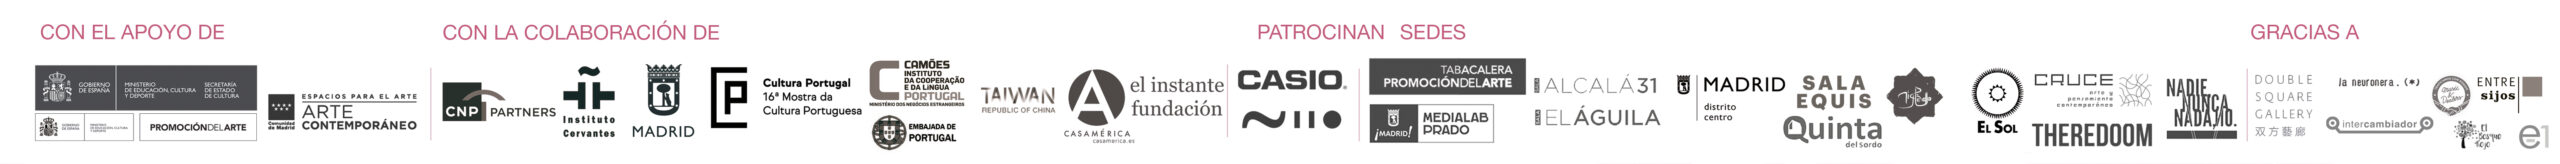 PROYECTOR2018_logos